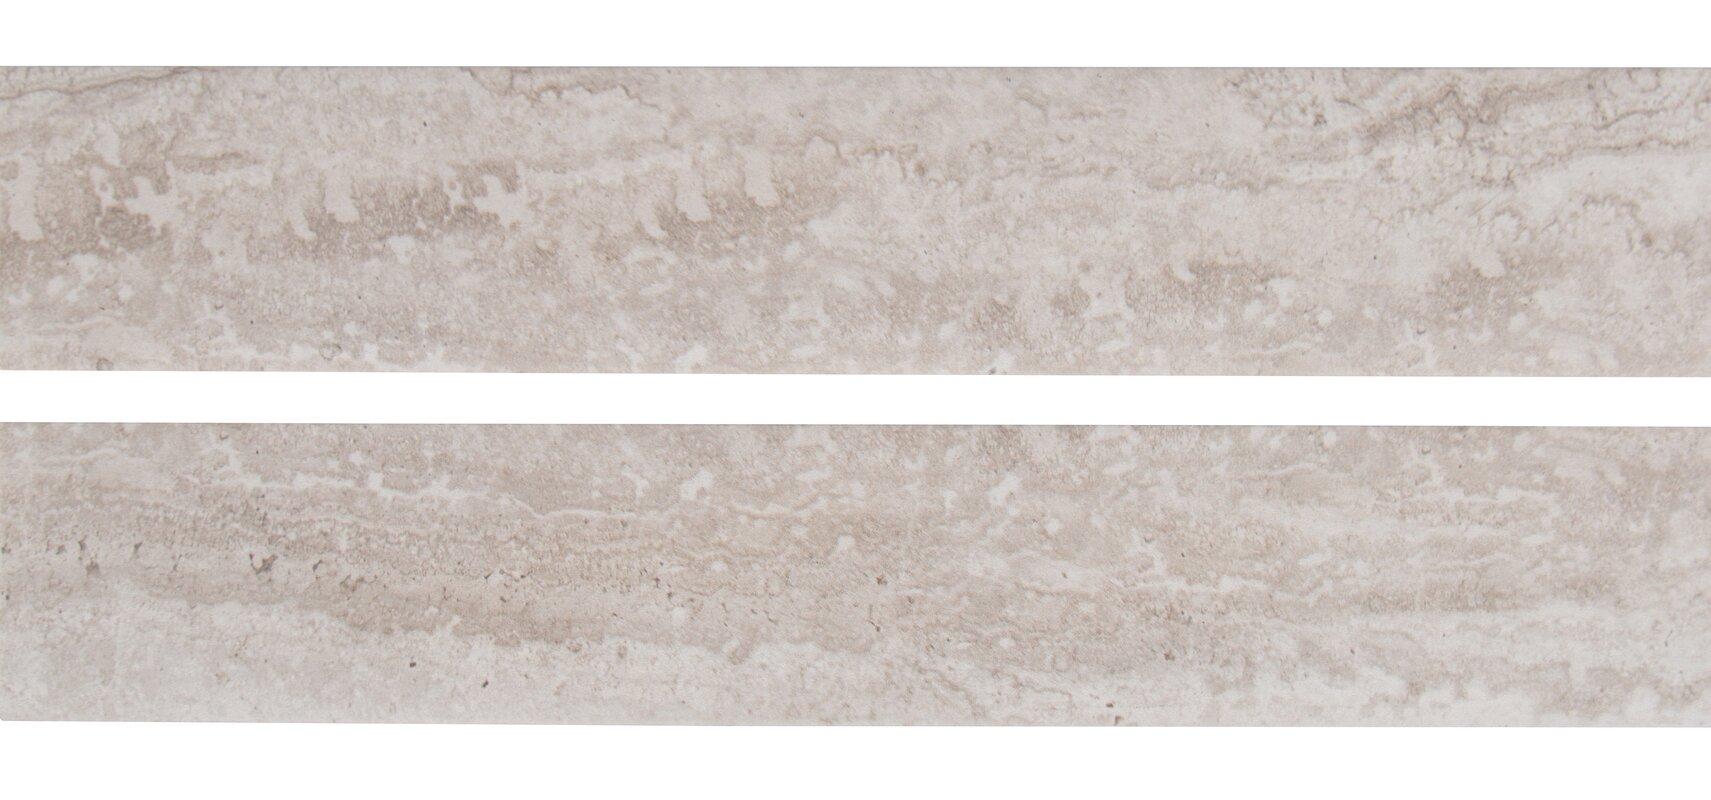 Msi sigaro 18 x 3 porcelain bullnose tile trim in off white sigaro 18 x 3 porcelain bullnose tile trim in off white dailygadgetfo Gallery